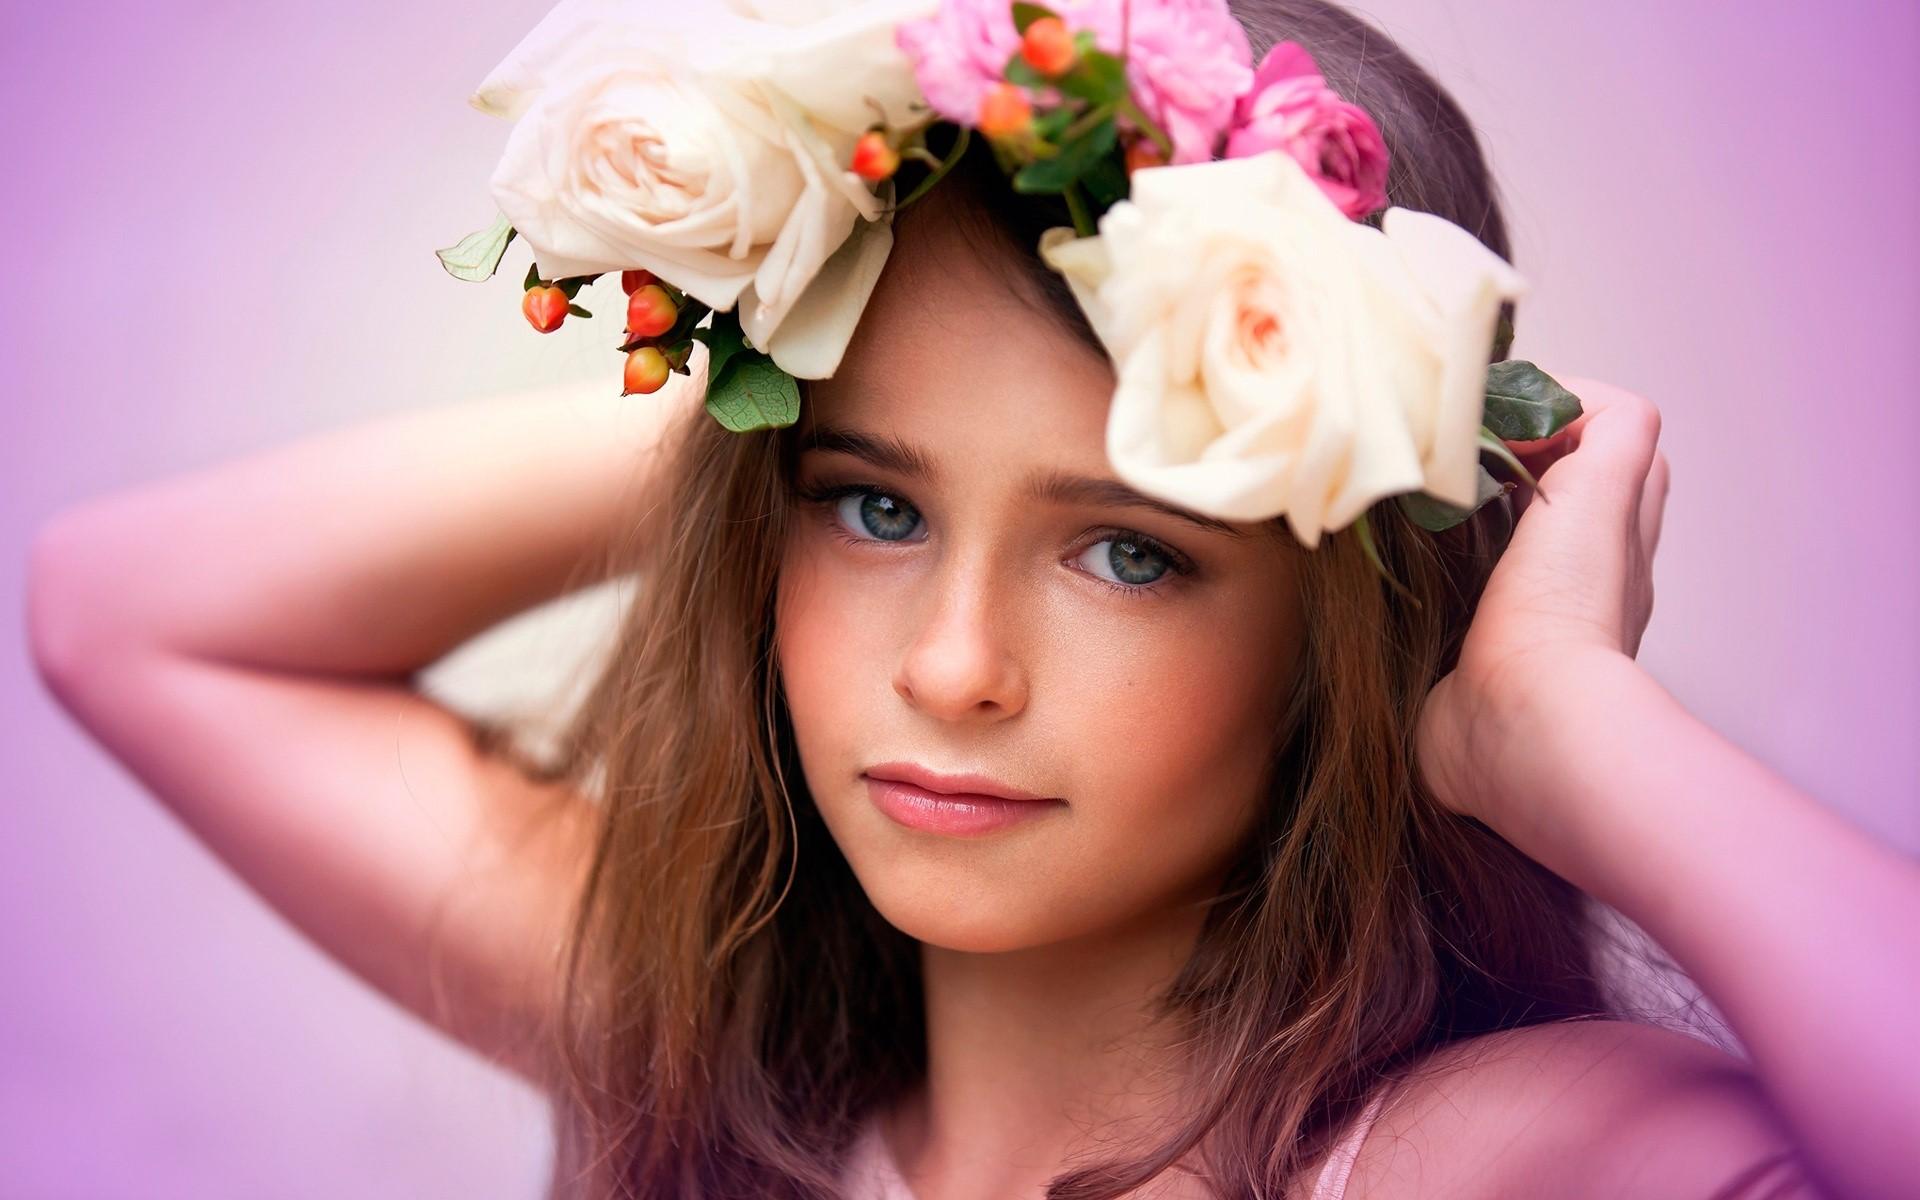 Fondos de pantalla Una niña con flores